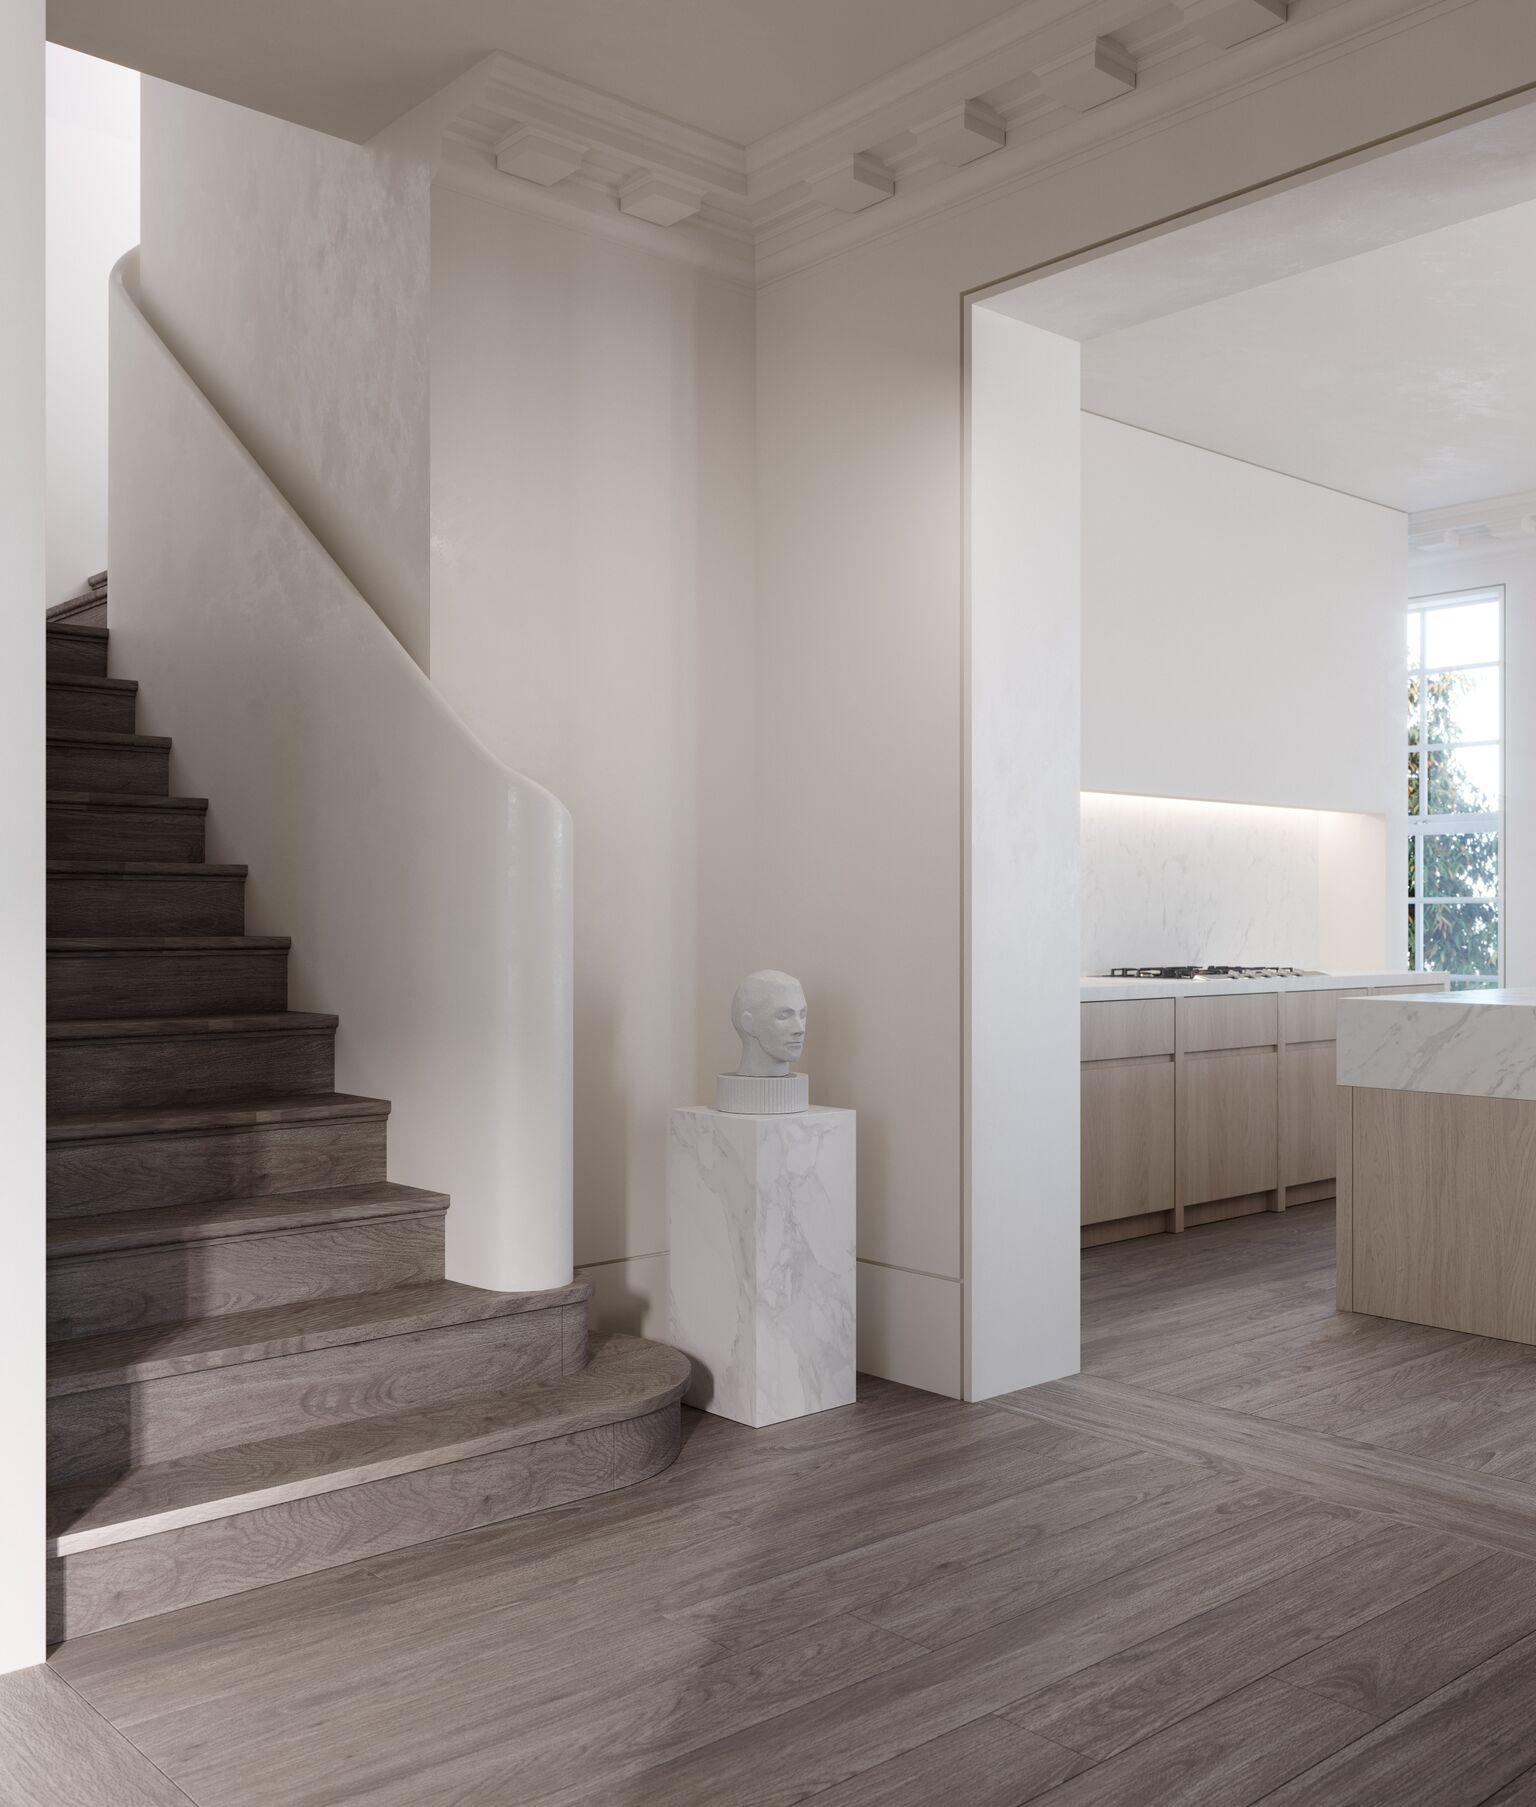 Gallery Of Conrad Architects Local Australian Residential Interior Design Cremorne, Melbourne Image 14